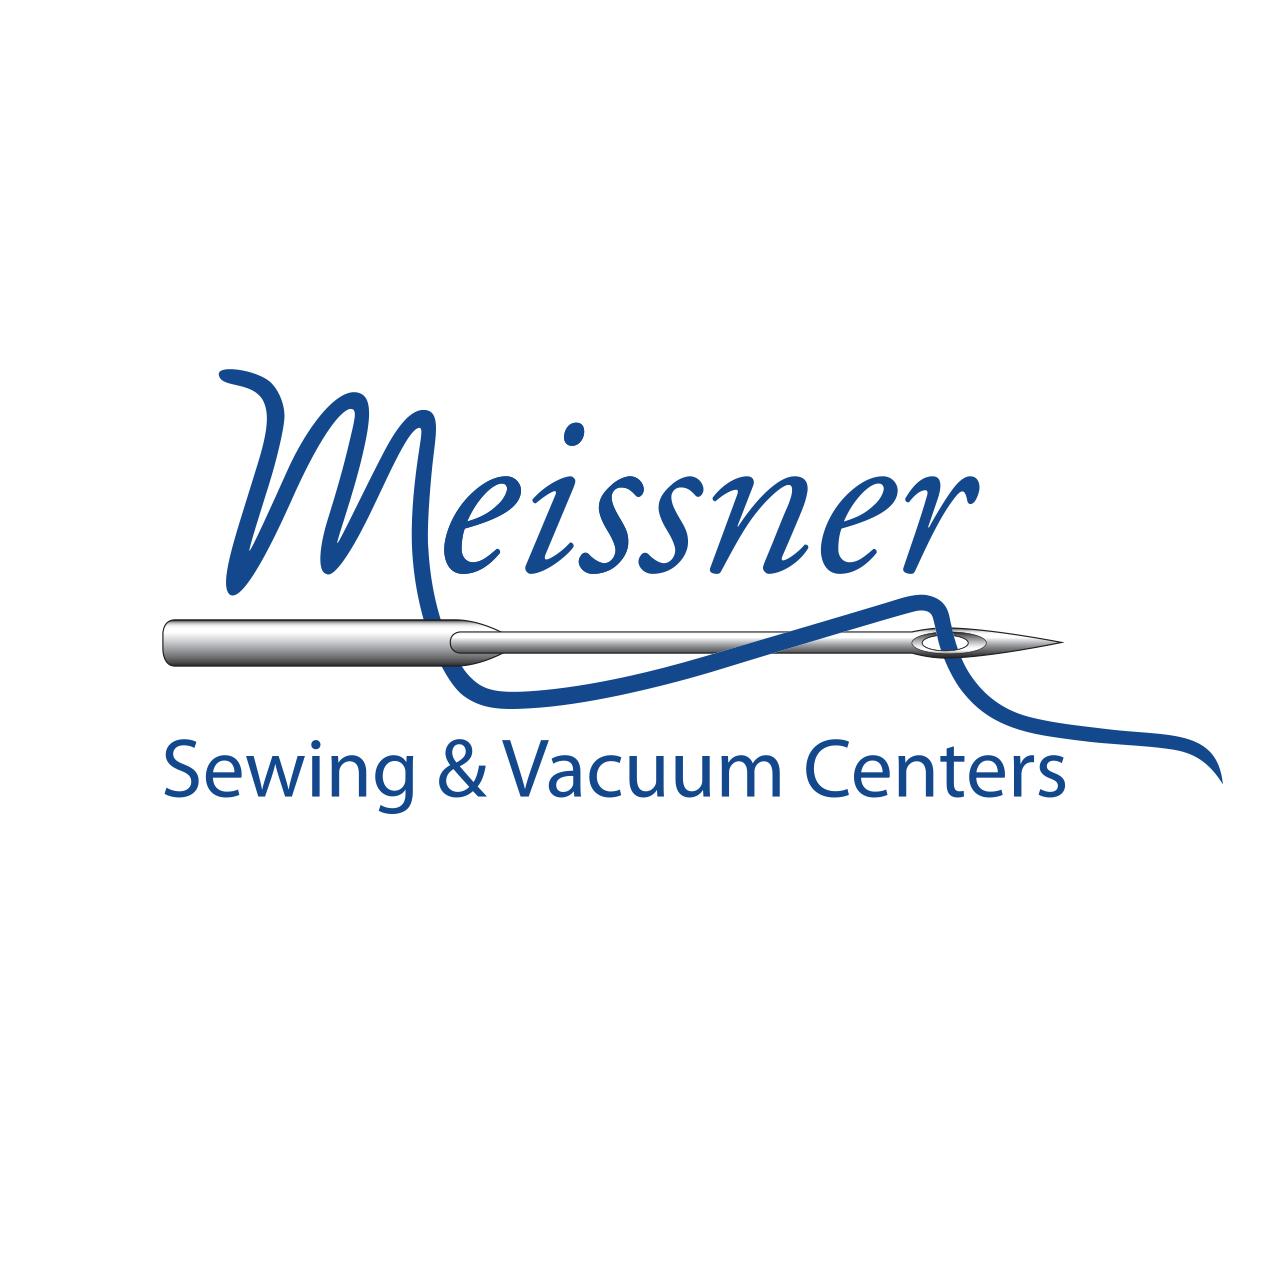 Industrial sewing machines: classes, purpose, maintenance 35